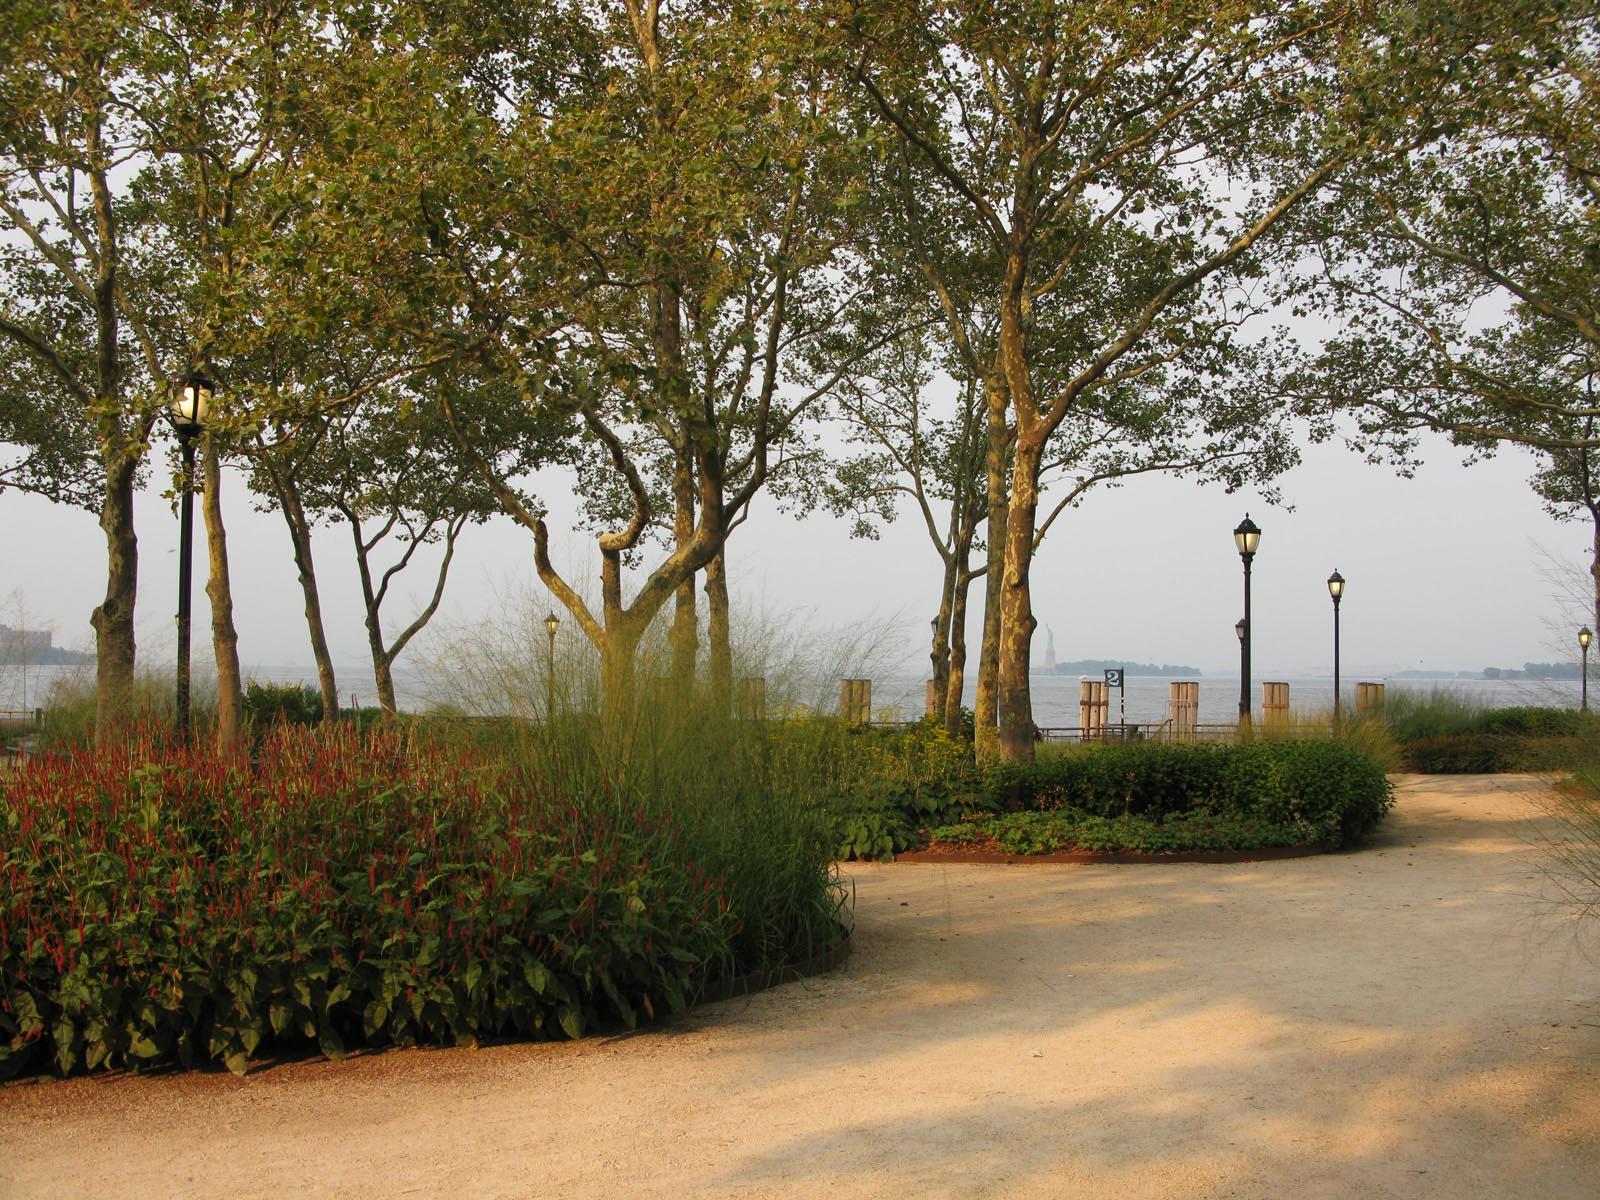 Poemas del río Wang: The Battery Gardens